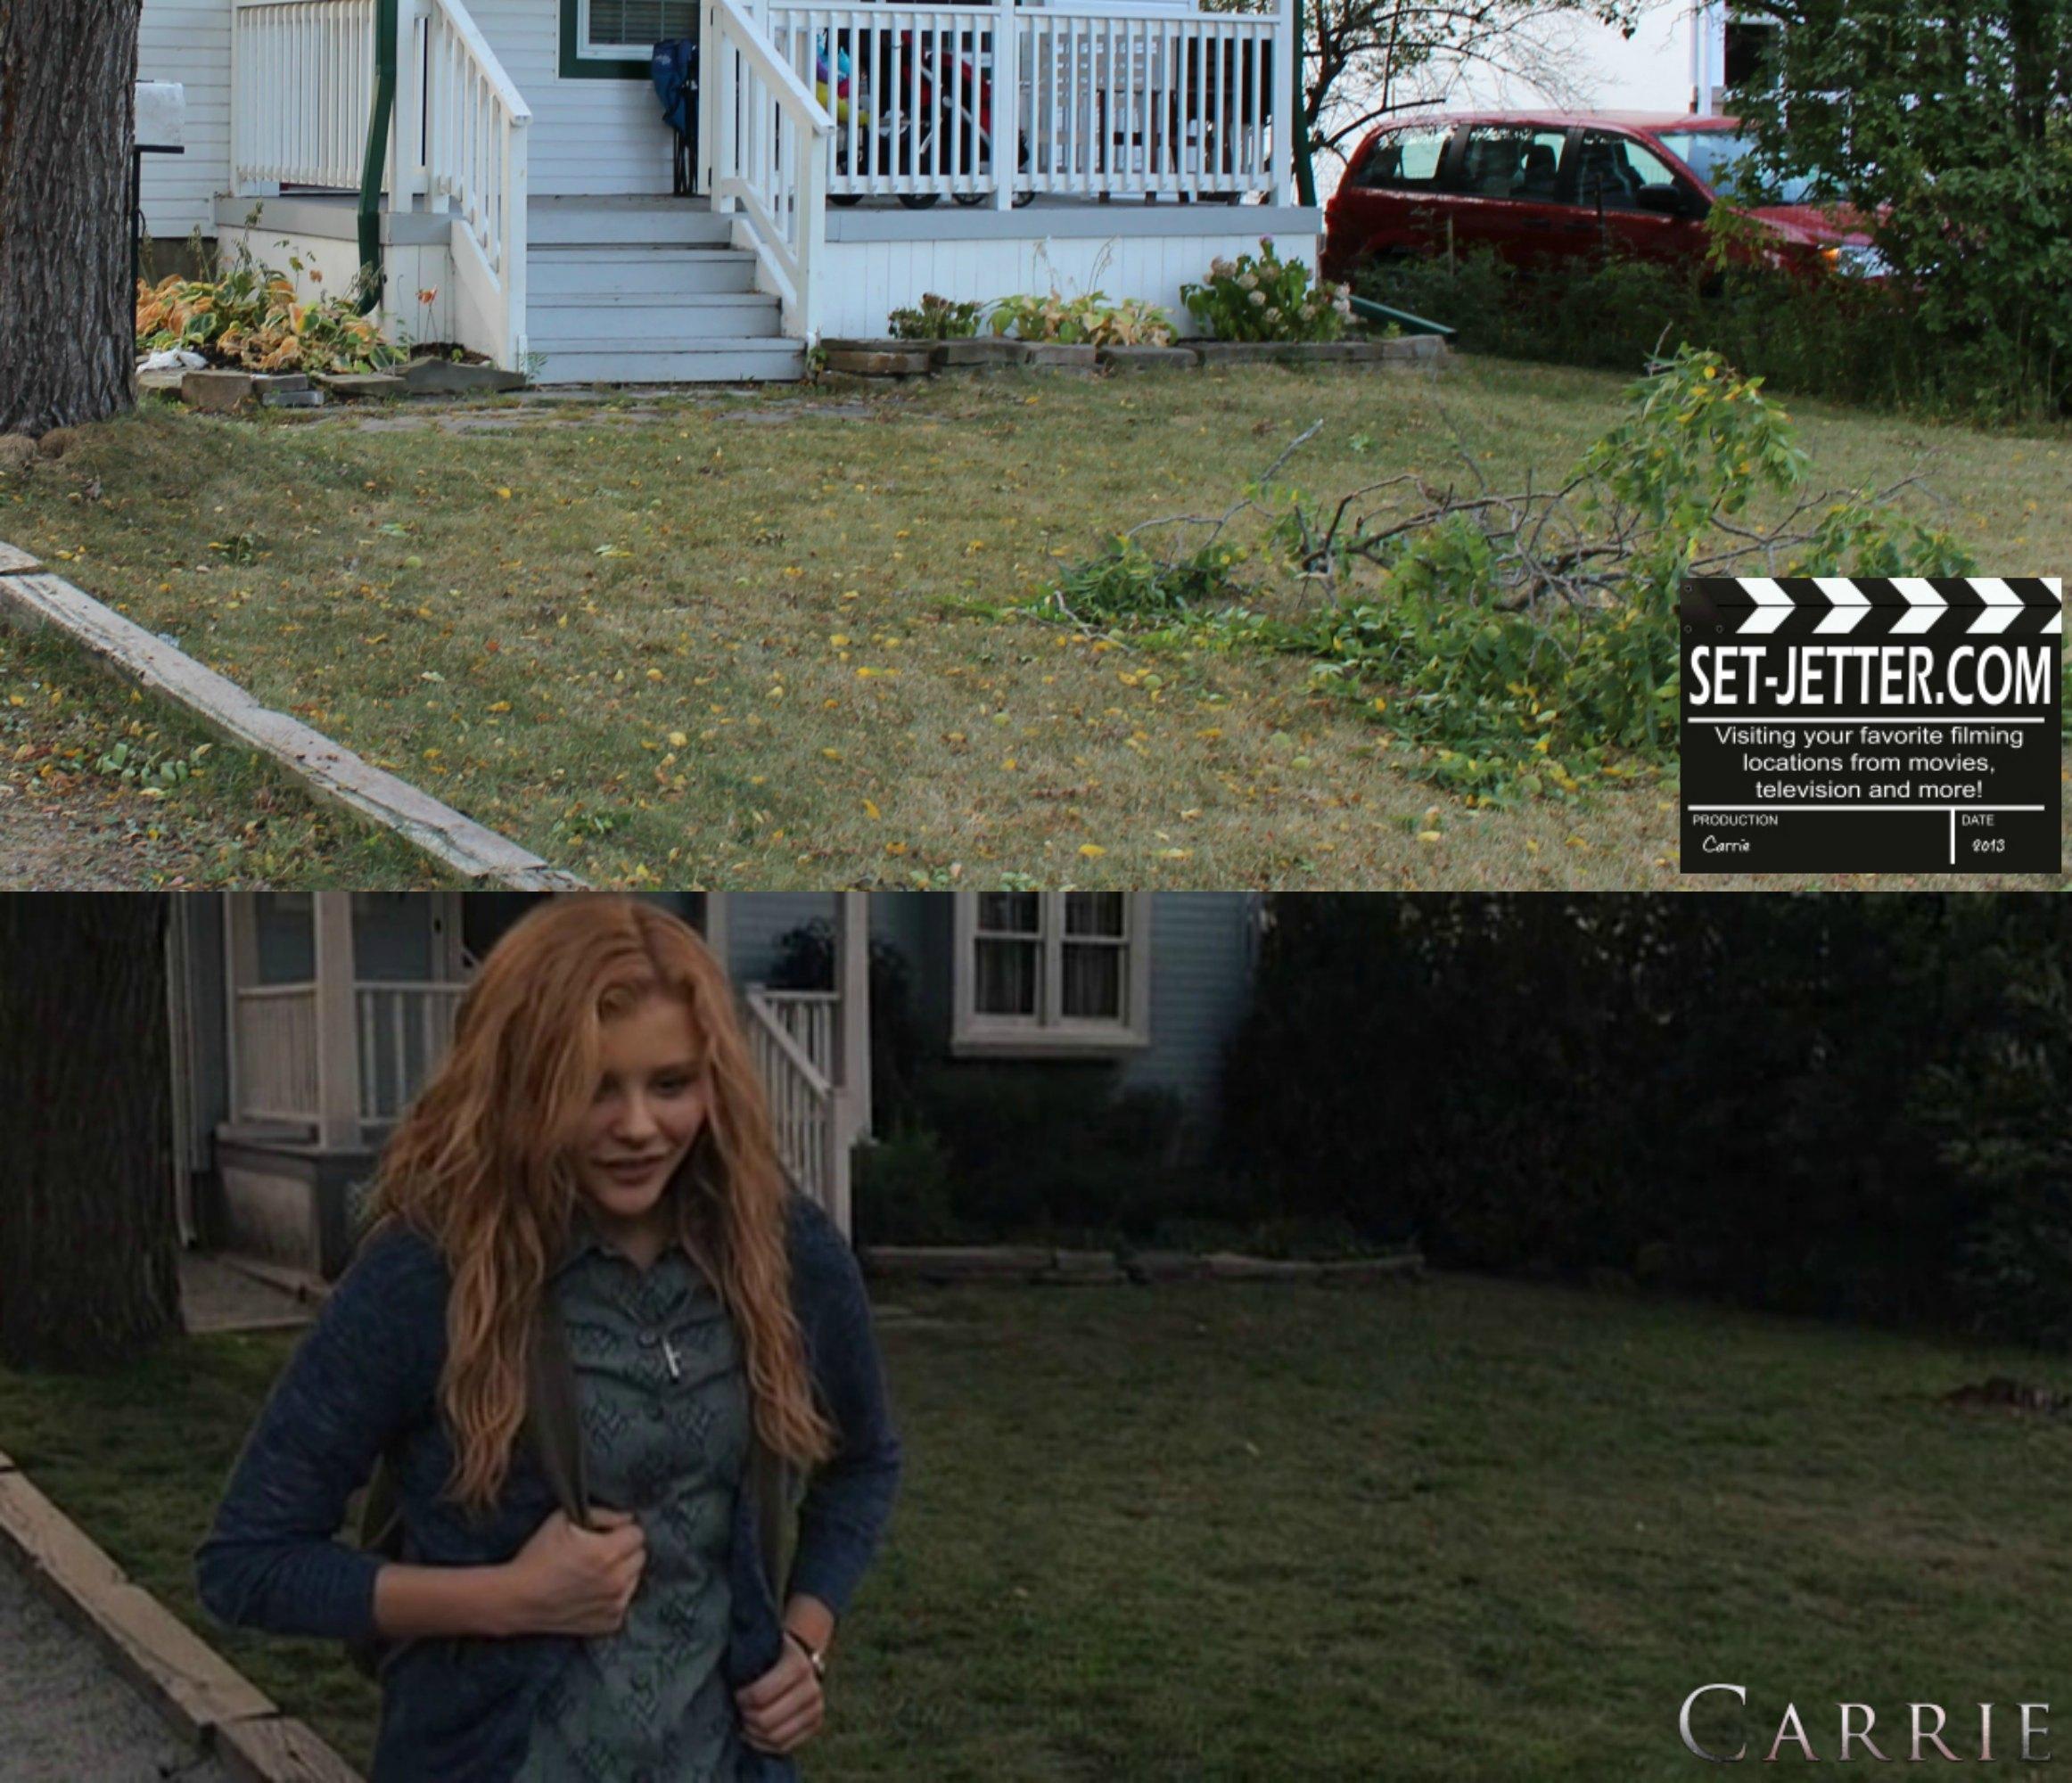 Carrie 2013 comparison 25.jpg